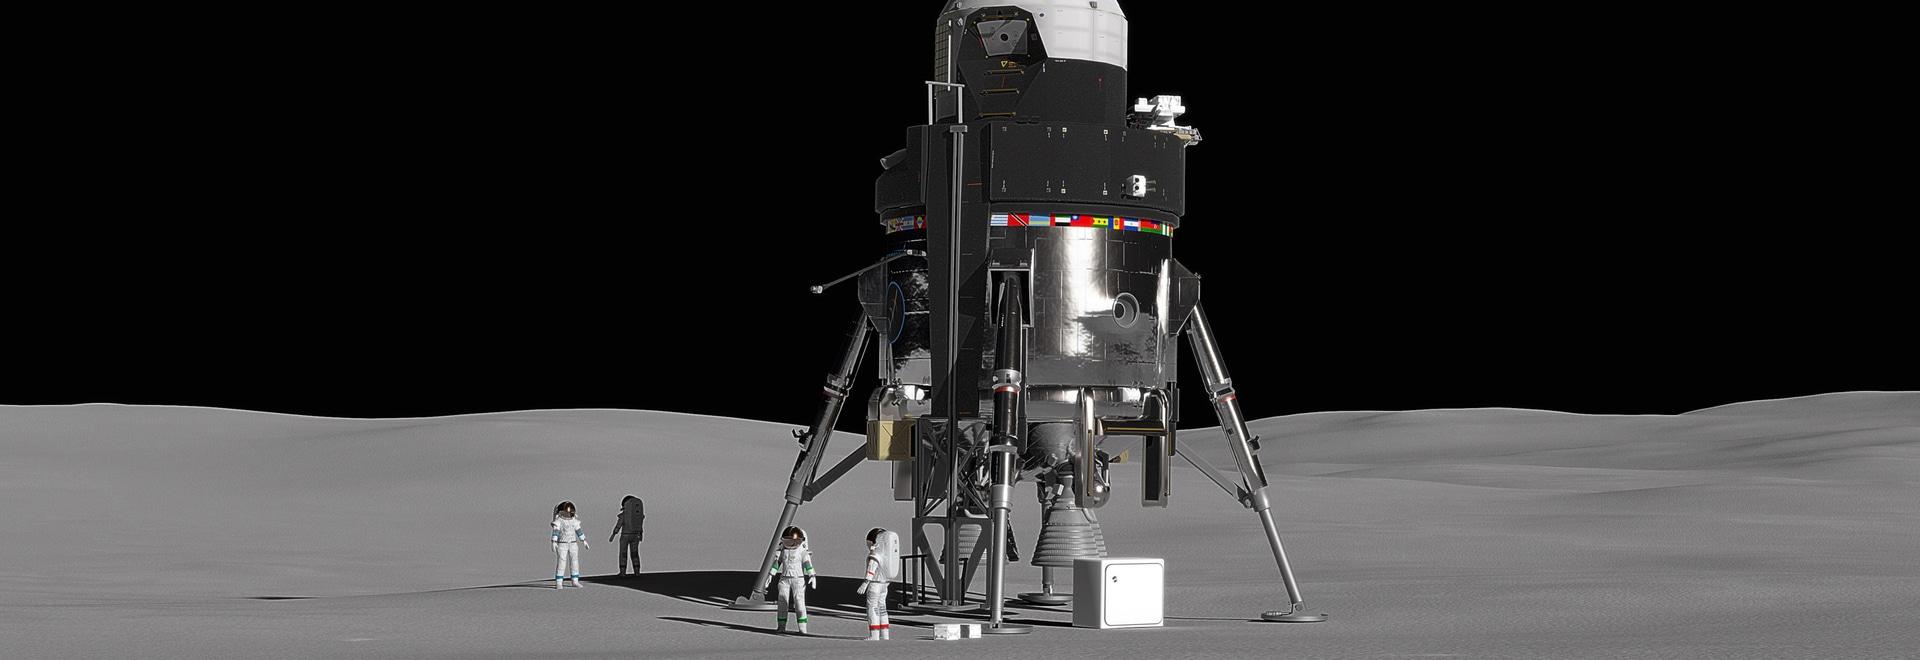 Lockheed Martin Crewed-Lunar-Lander